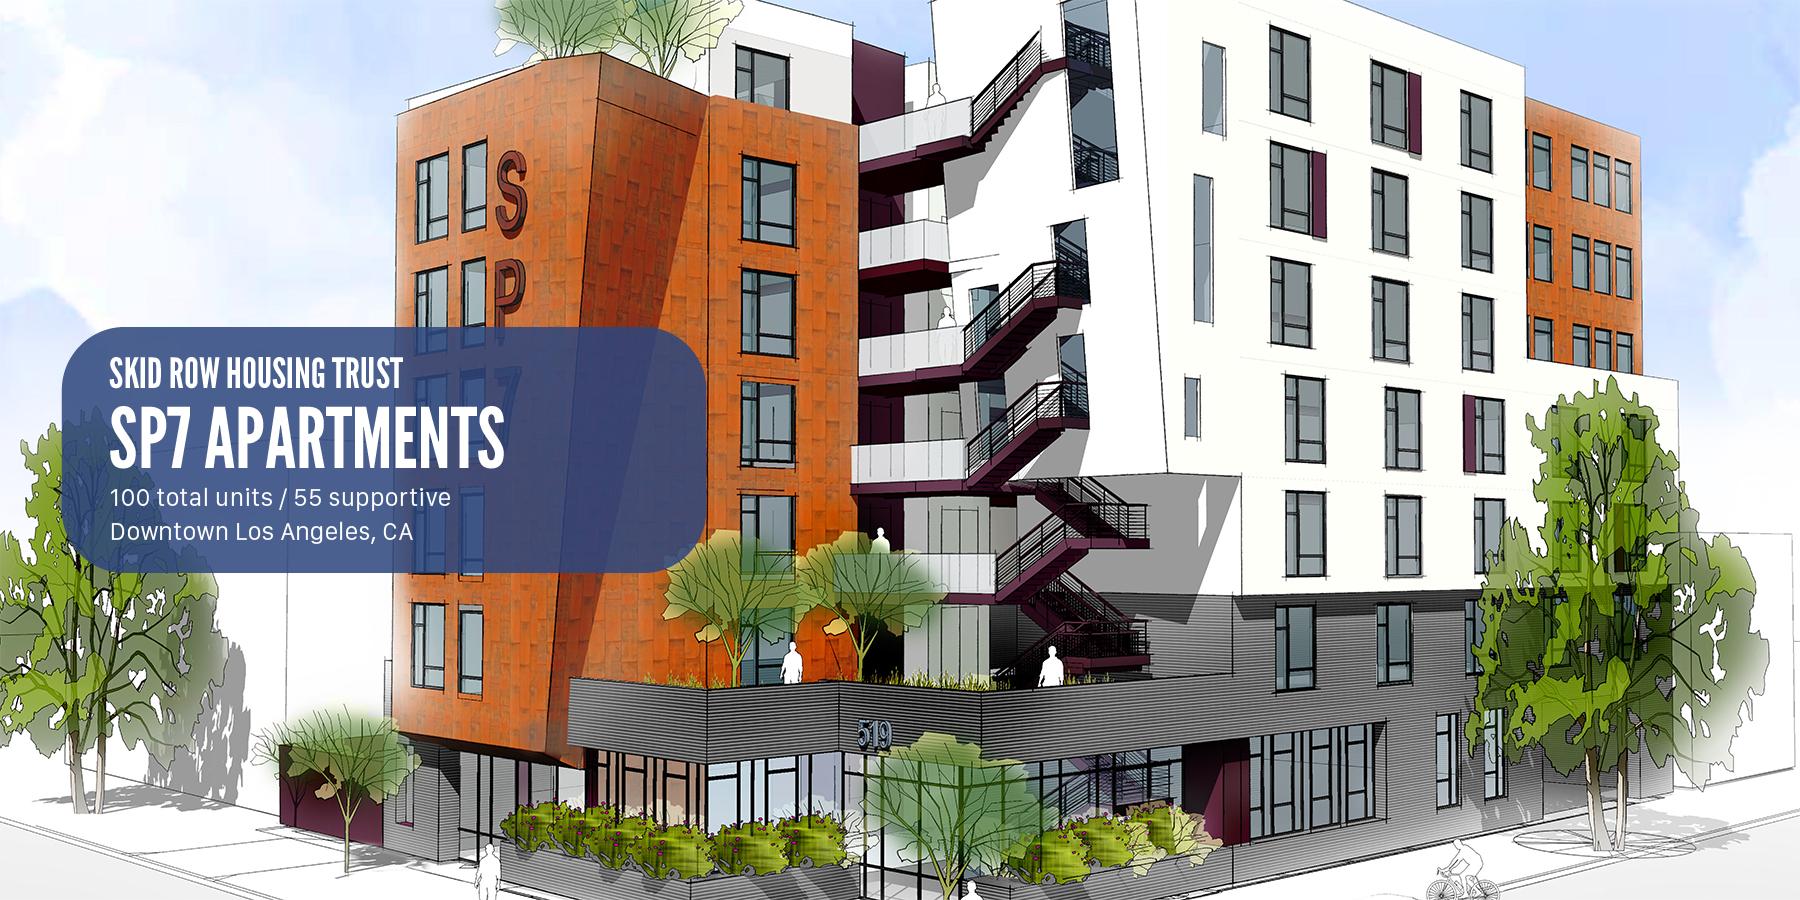 Skid_Row_-_SP7_Apartments.jpg